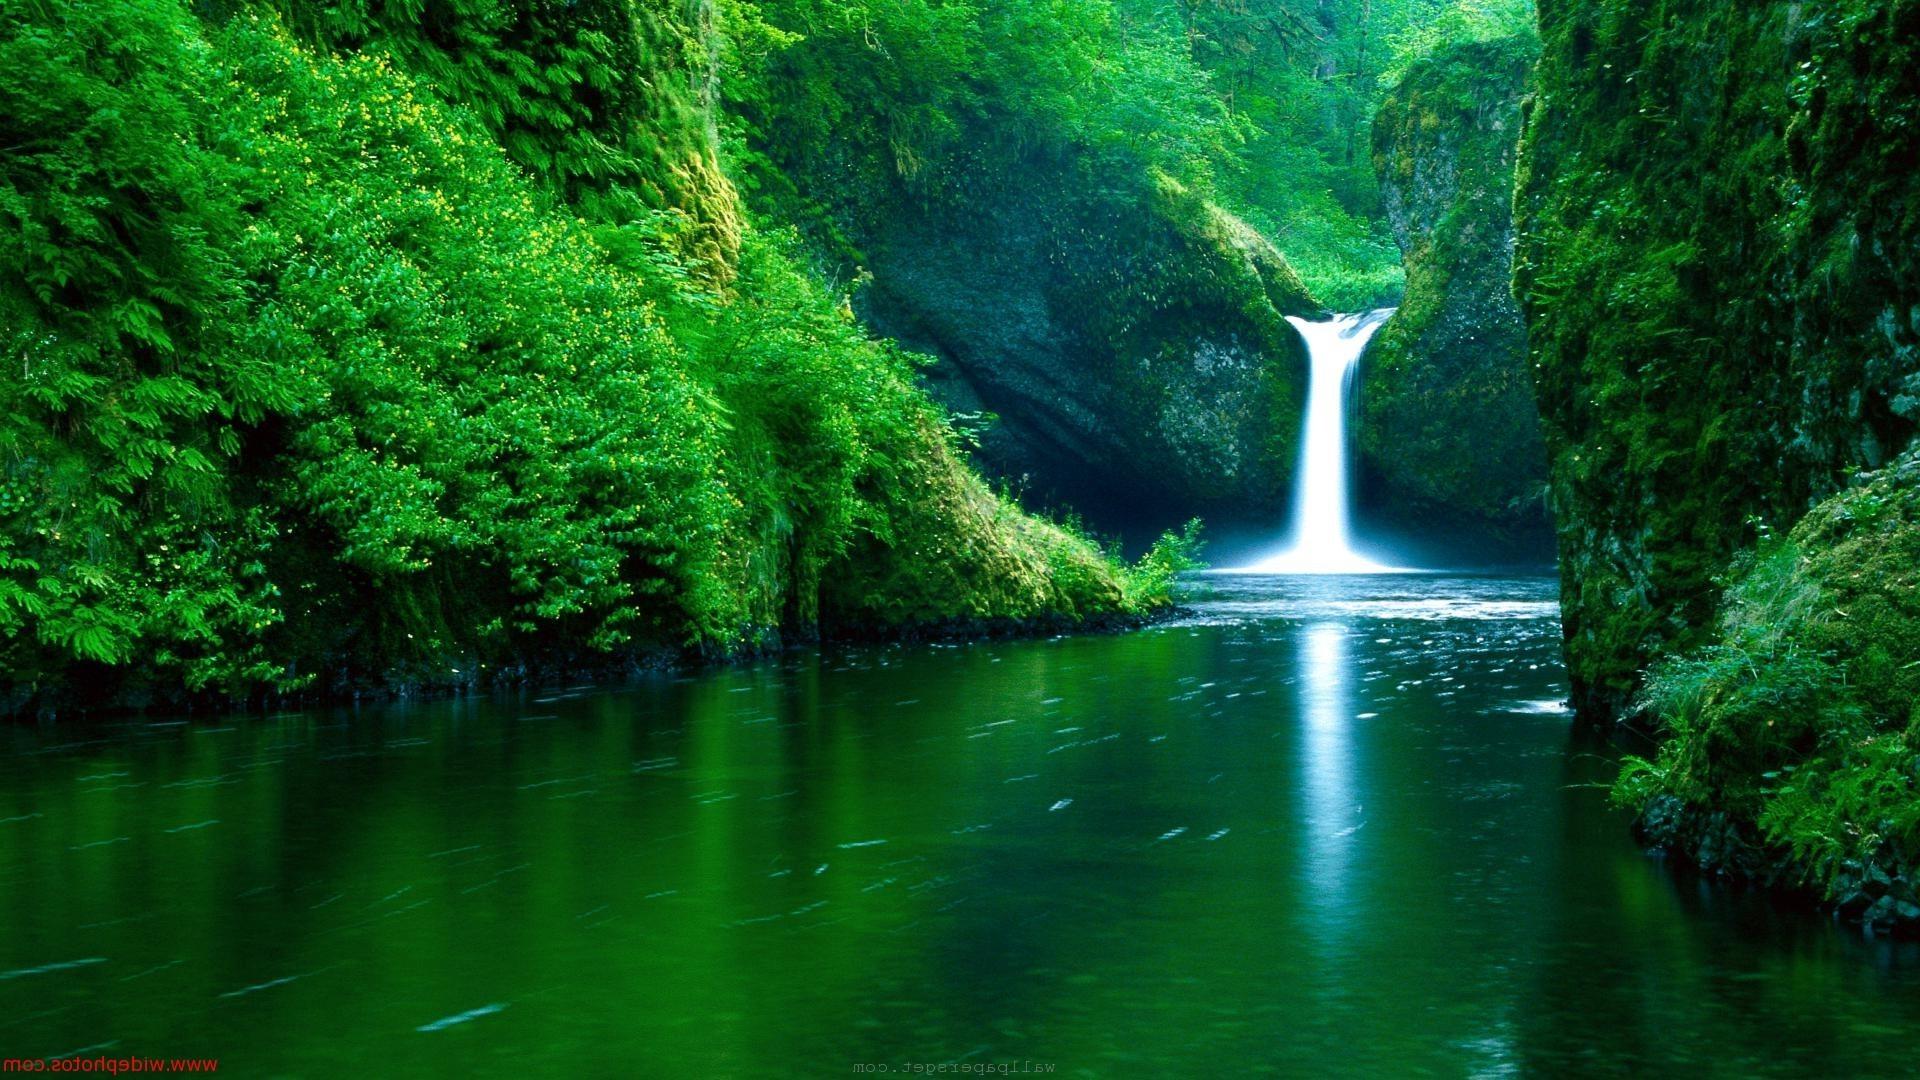 Most Beautiful Nature Wallpapers For Desktop   wallpaper 1920x1080